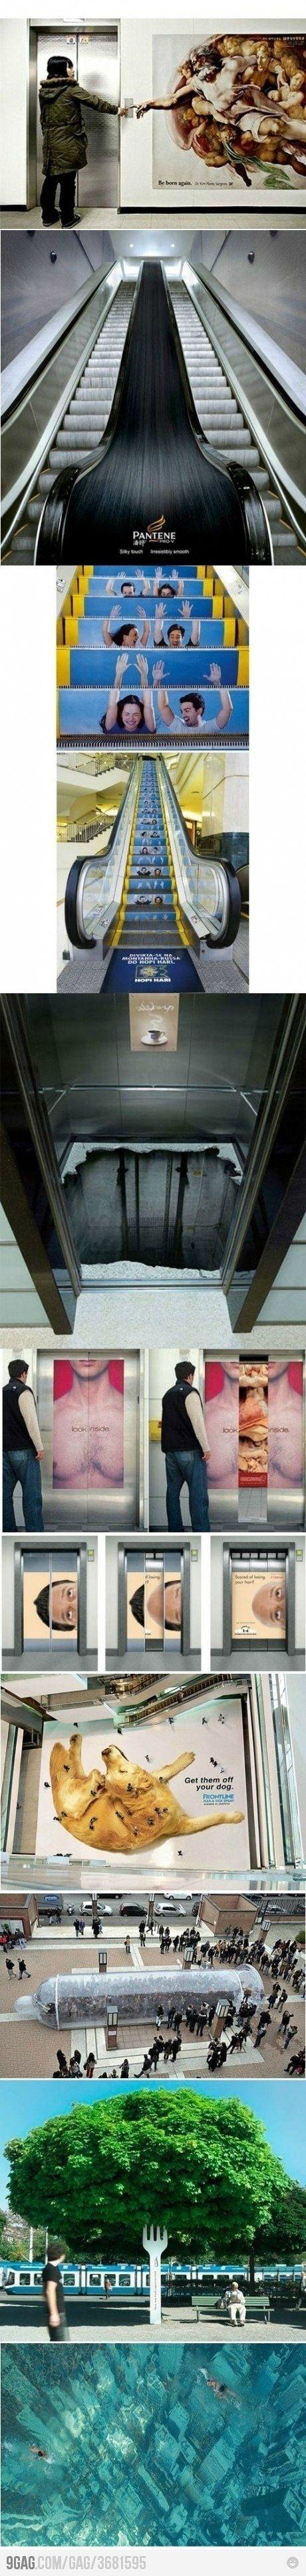 amazing ads    Advertising